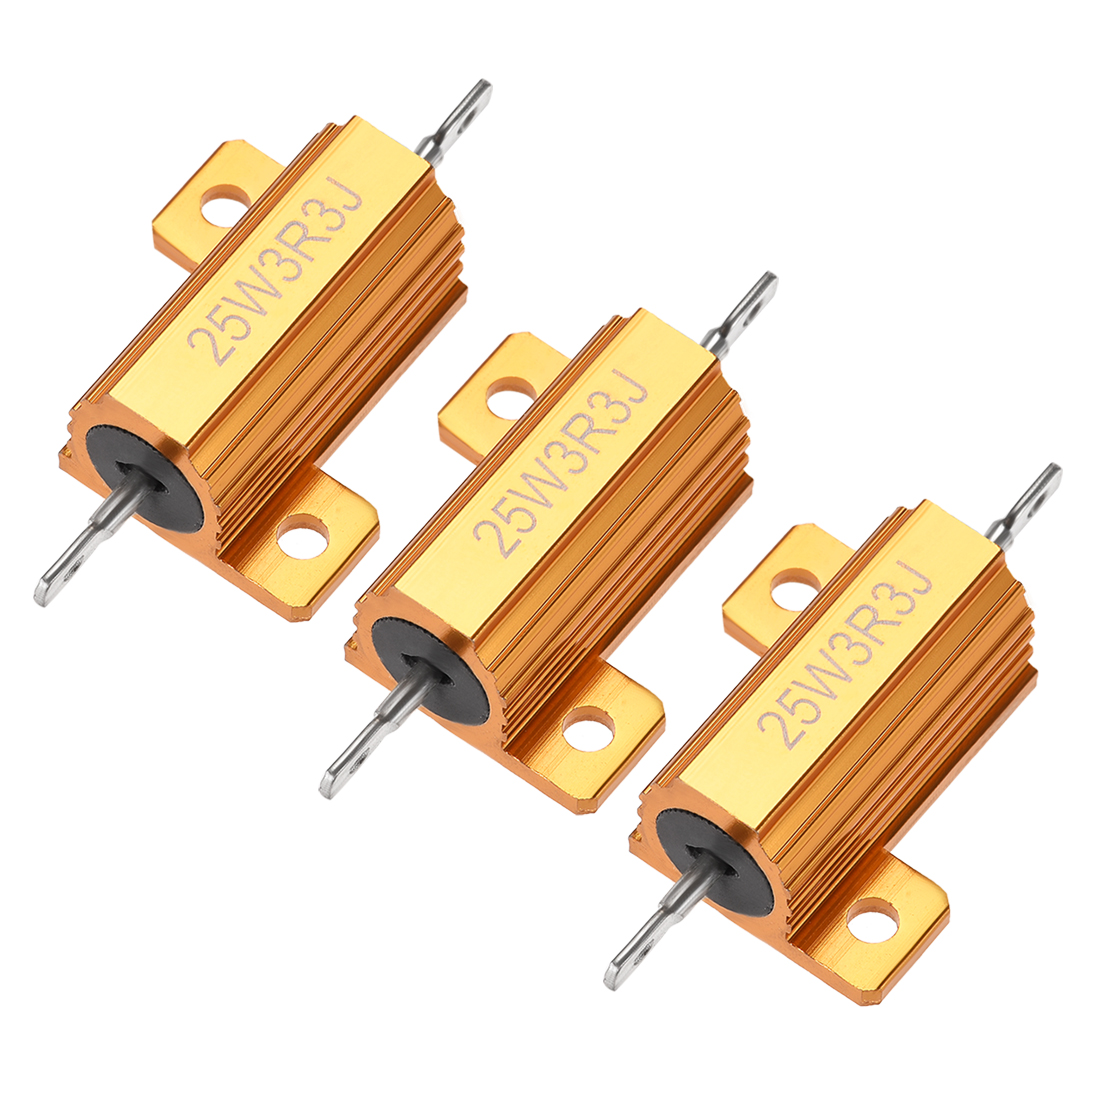 25W 3.3 Ohm 5% Aluminum Housing Resistor Wirewound Resistor Gold Tone 3 Pcs